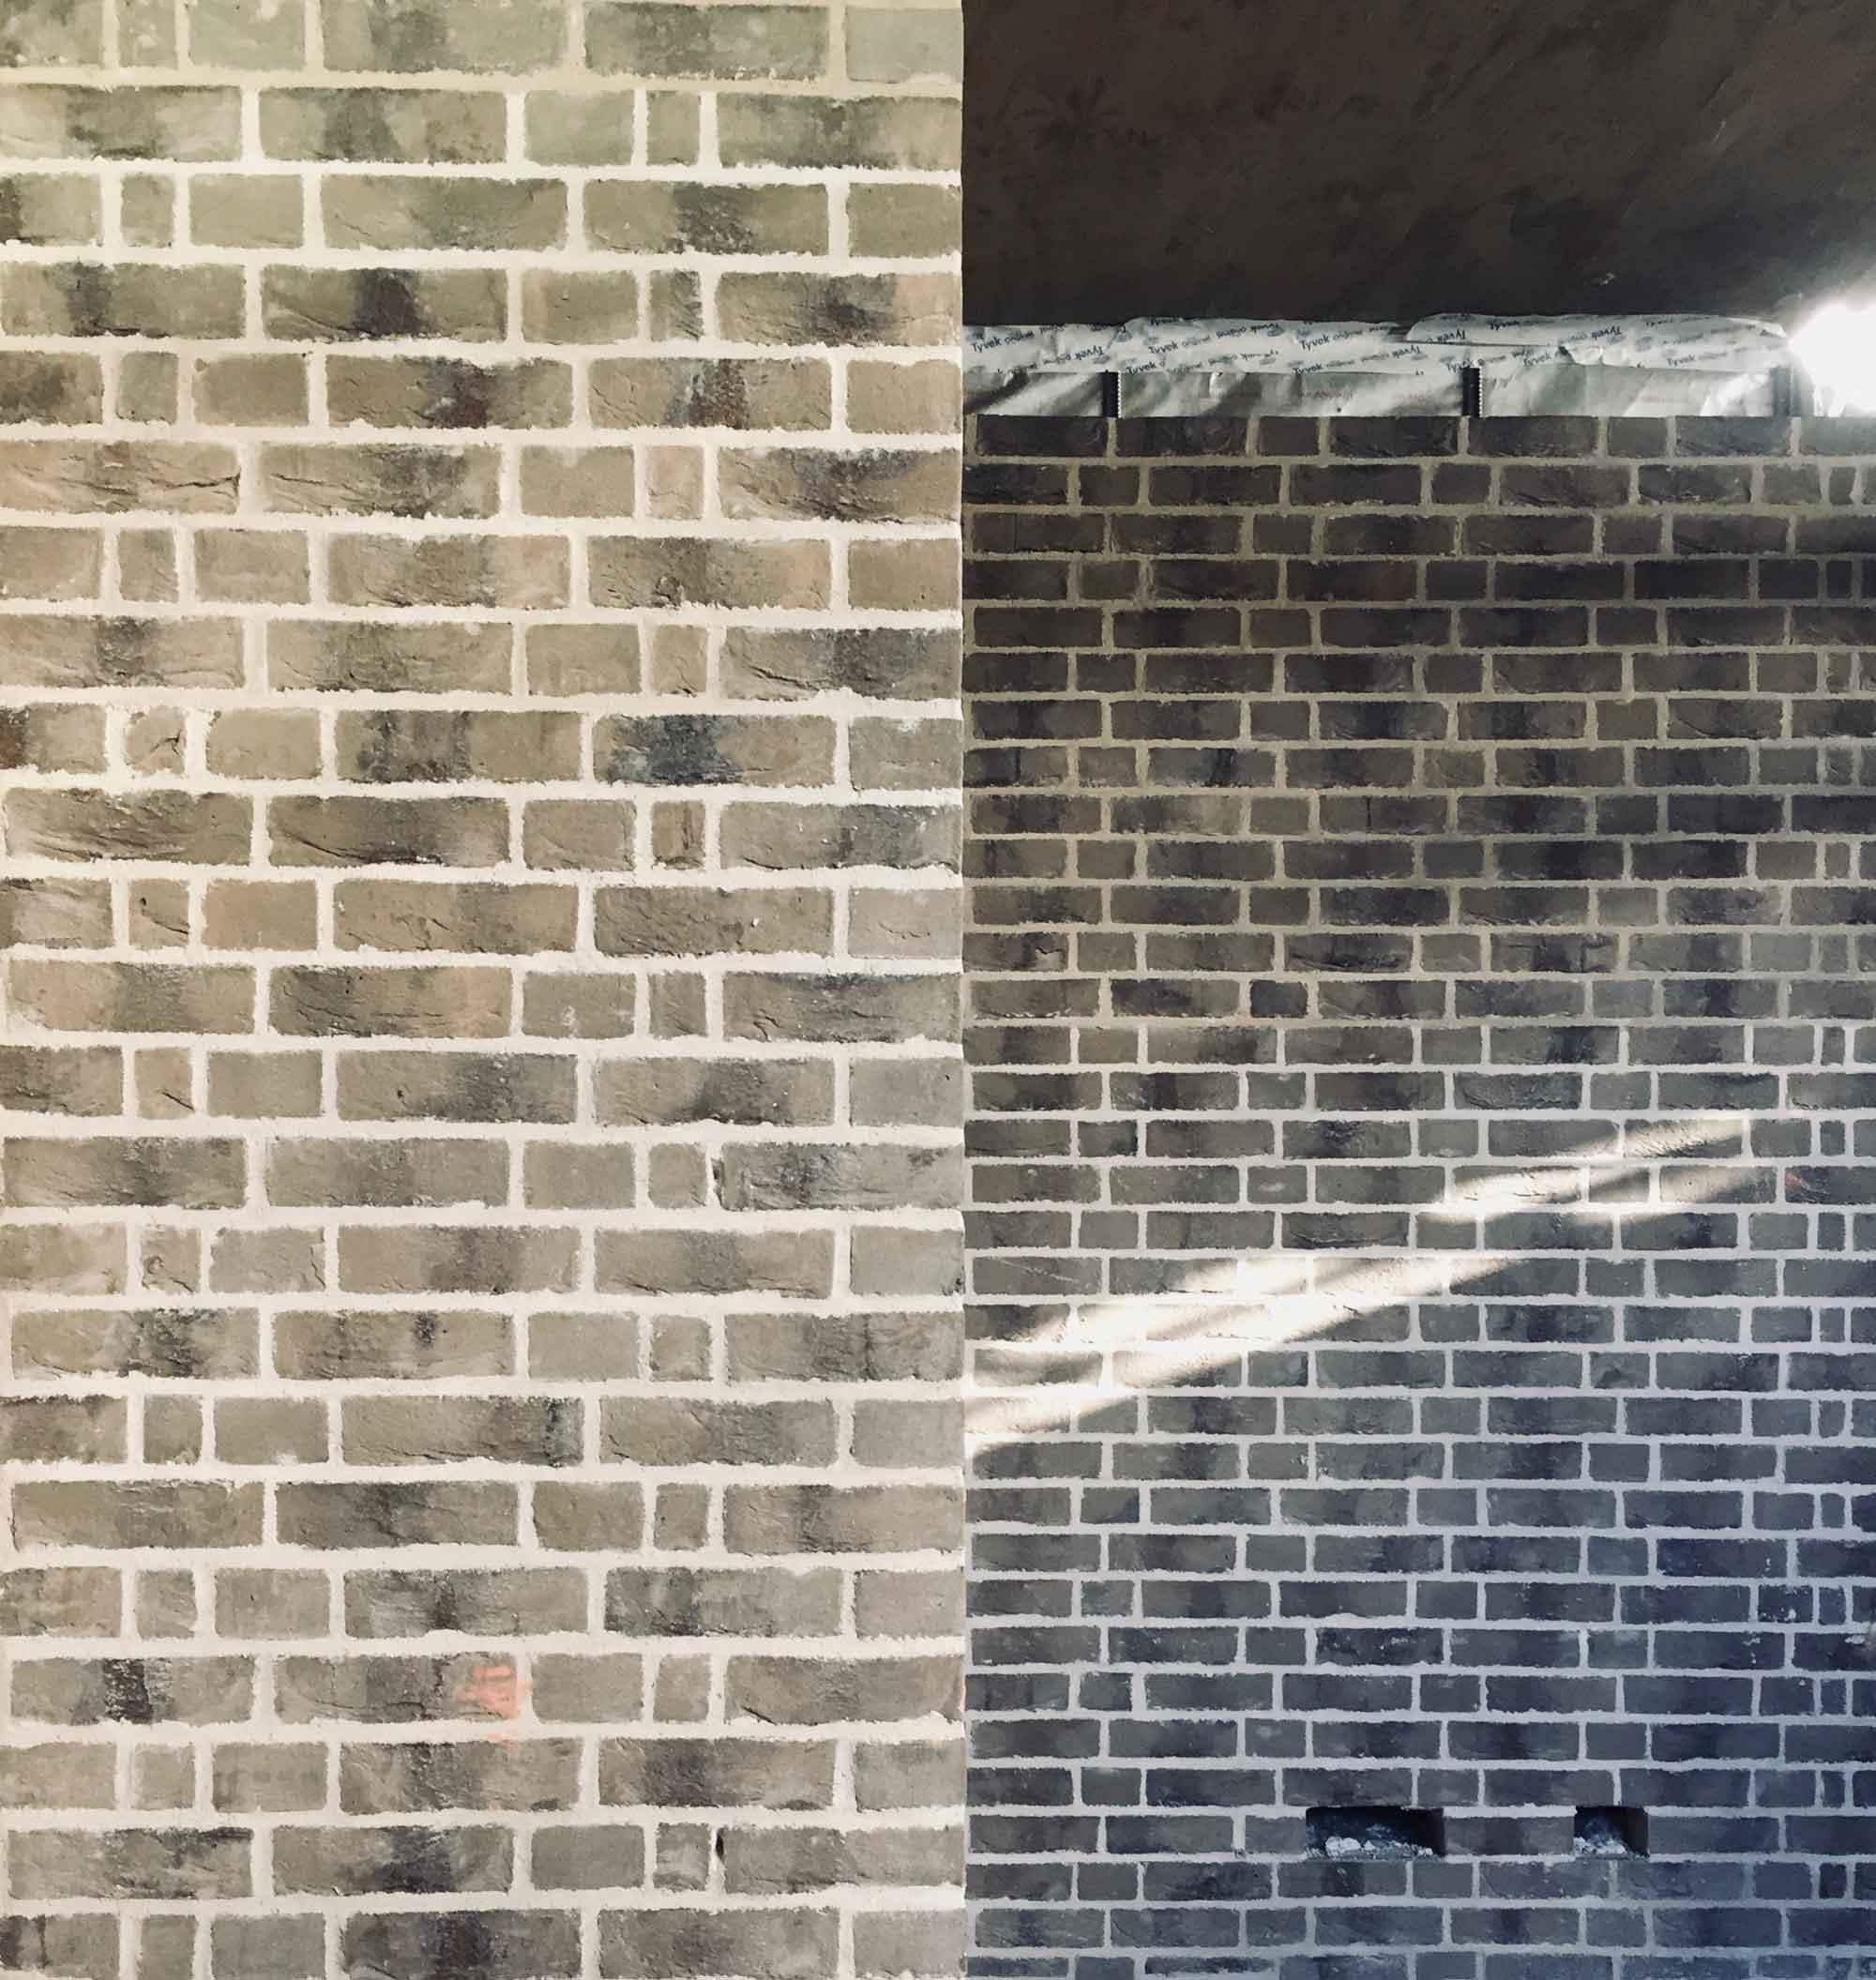 kensington-house-openstudio-architects-brick